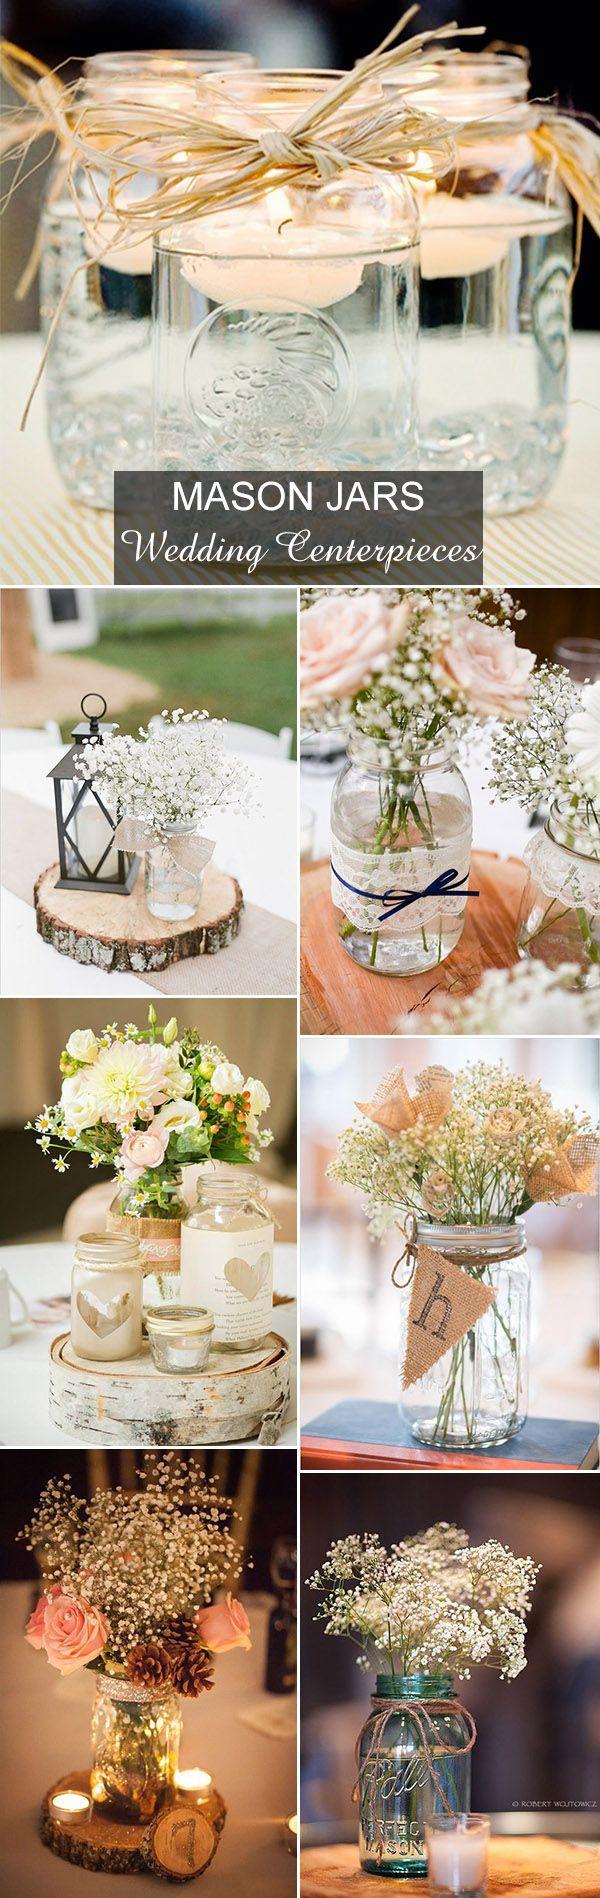 Diy wedding table decorations ideas  Rustic Wedding Ideas  Ways to Use Mason Jars  wedding time